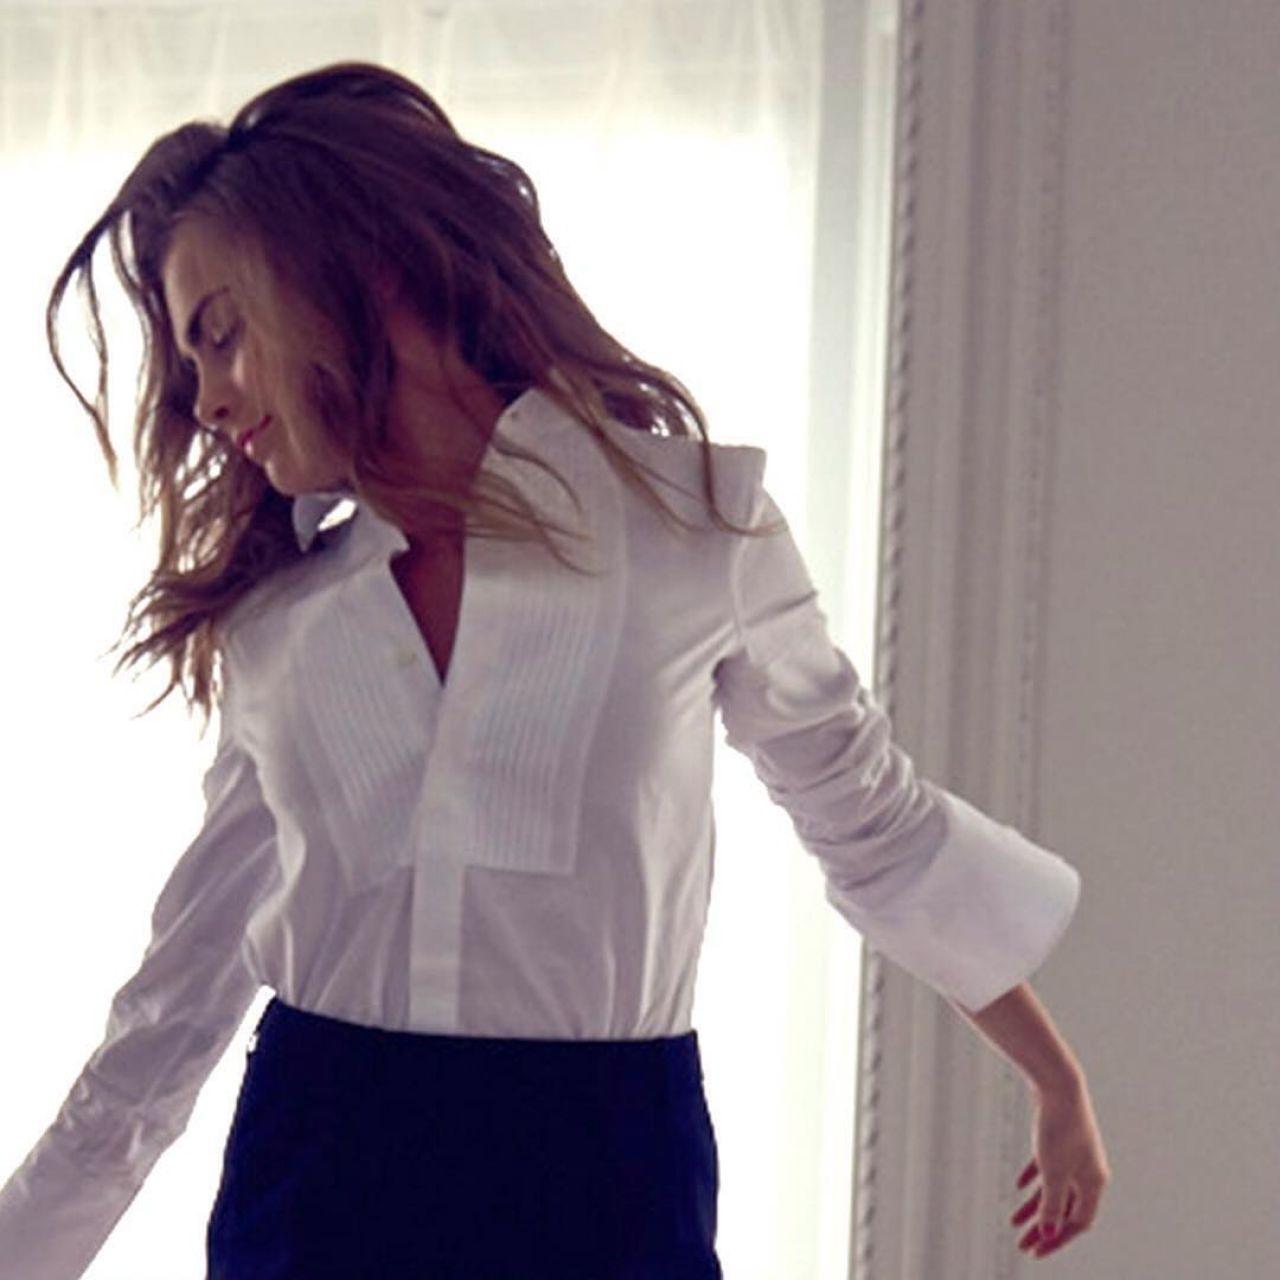 Cara Delevingne Photoshoot For Yves Saint Laurent Vinyl